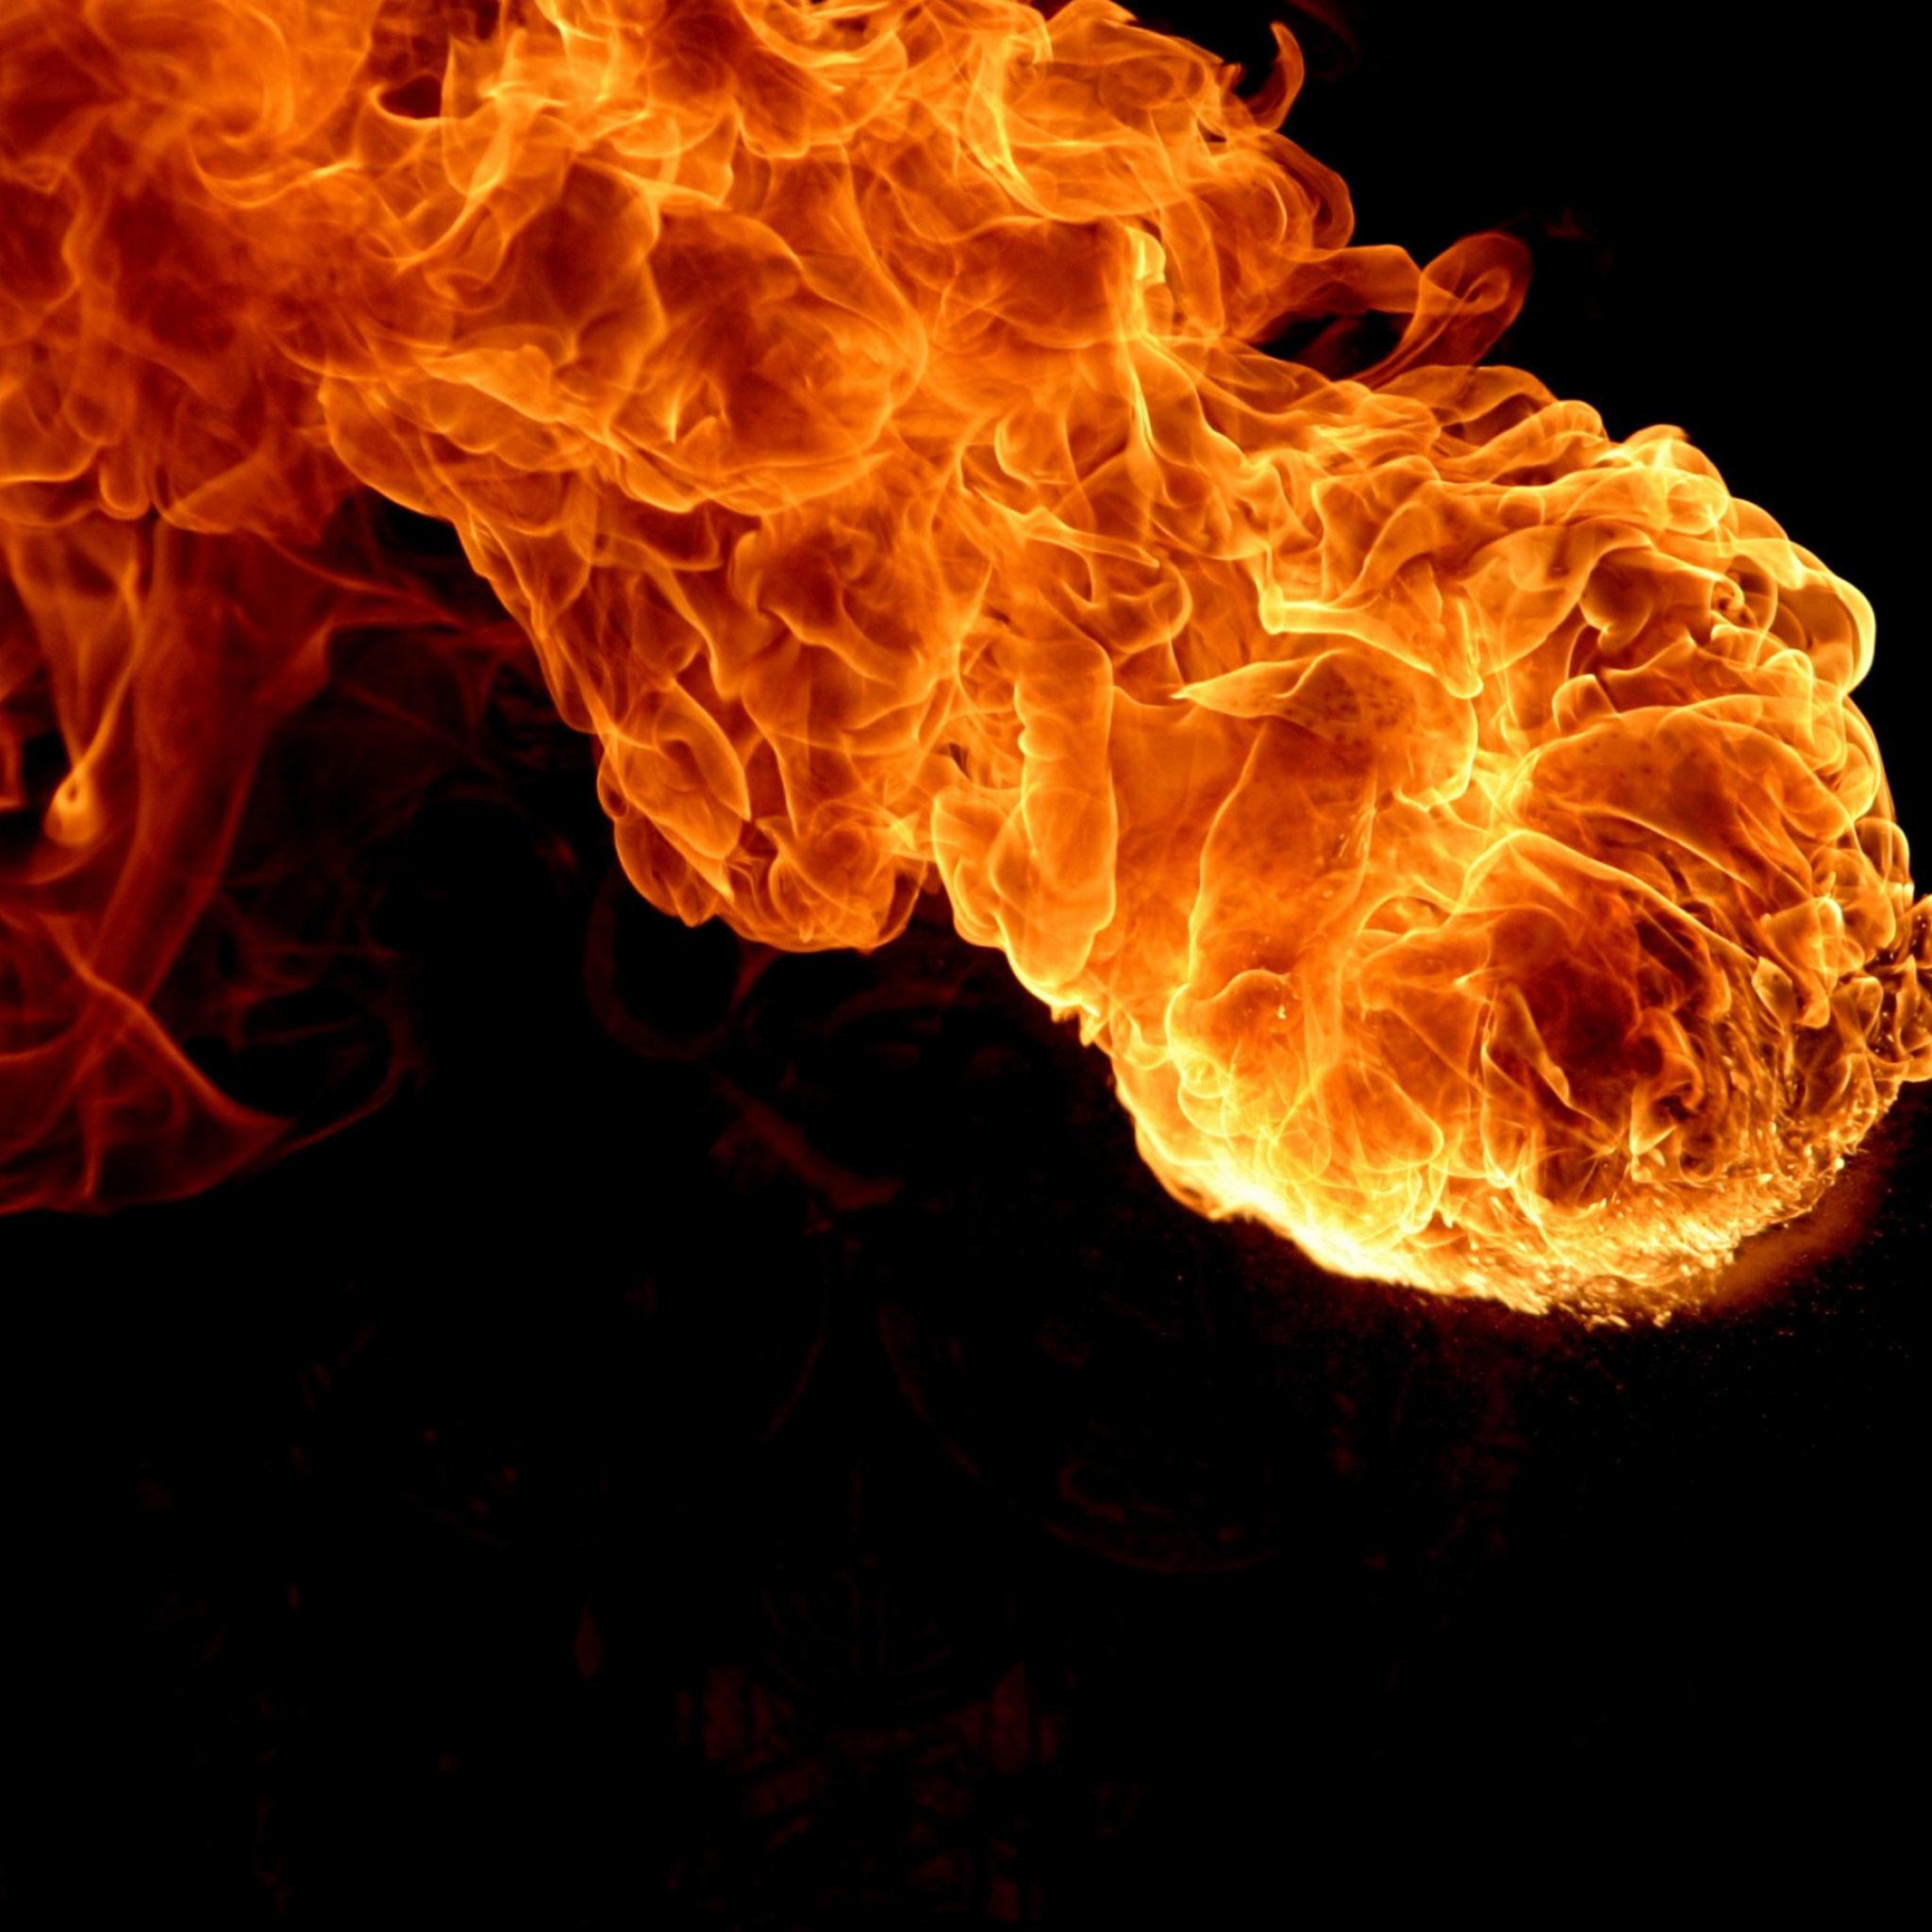 Fire Art iPad Wallpaper 12